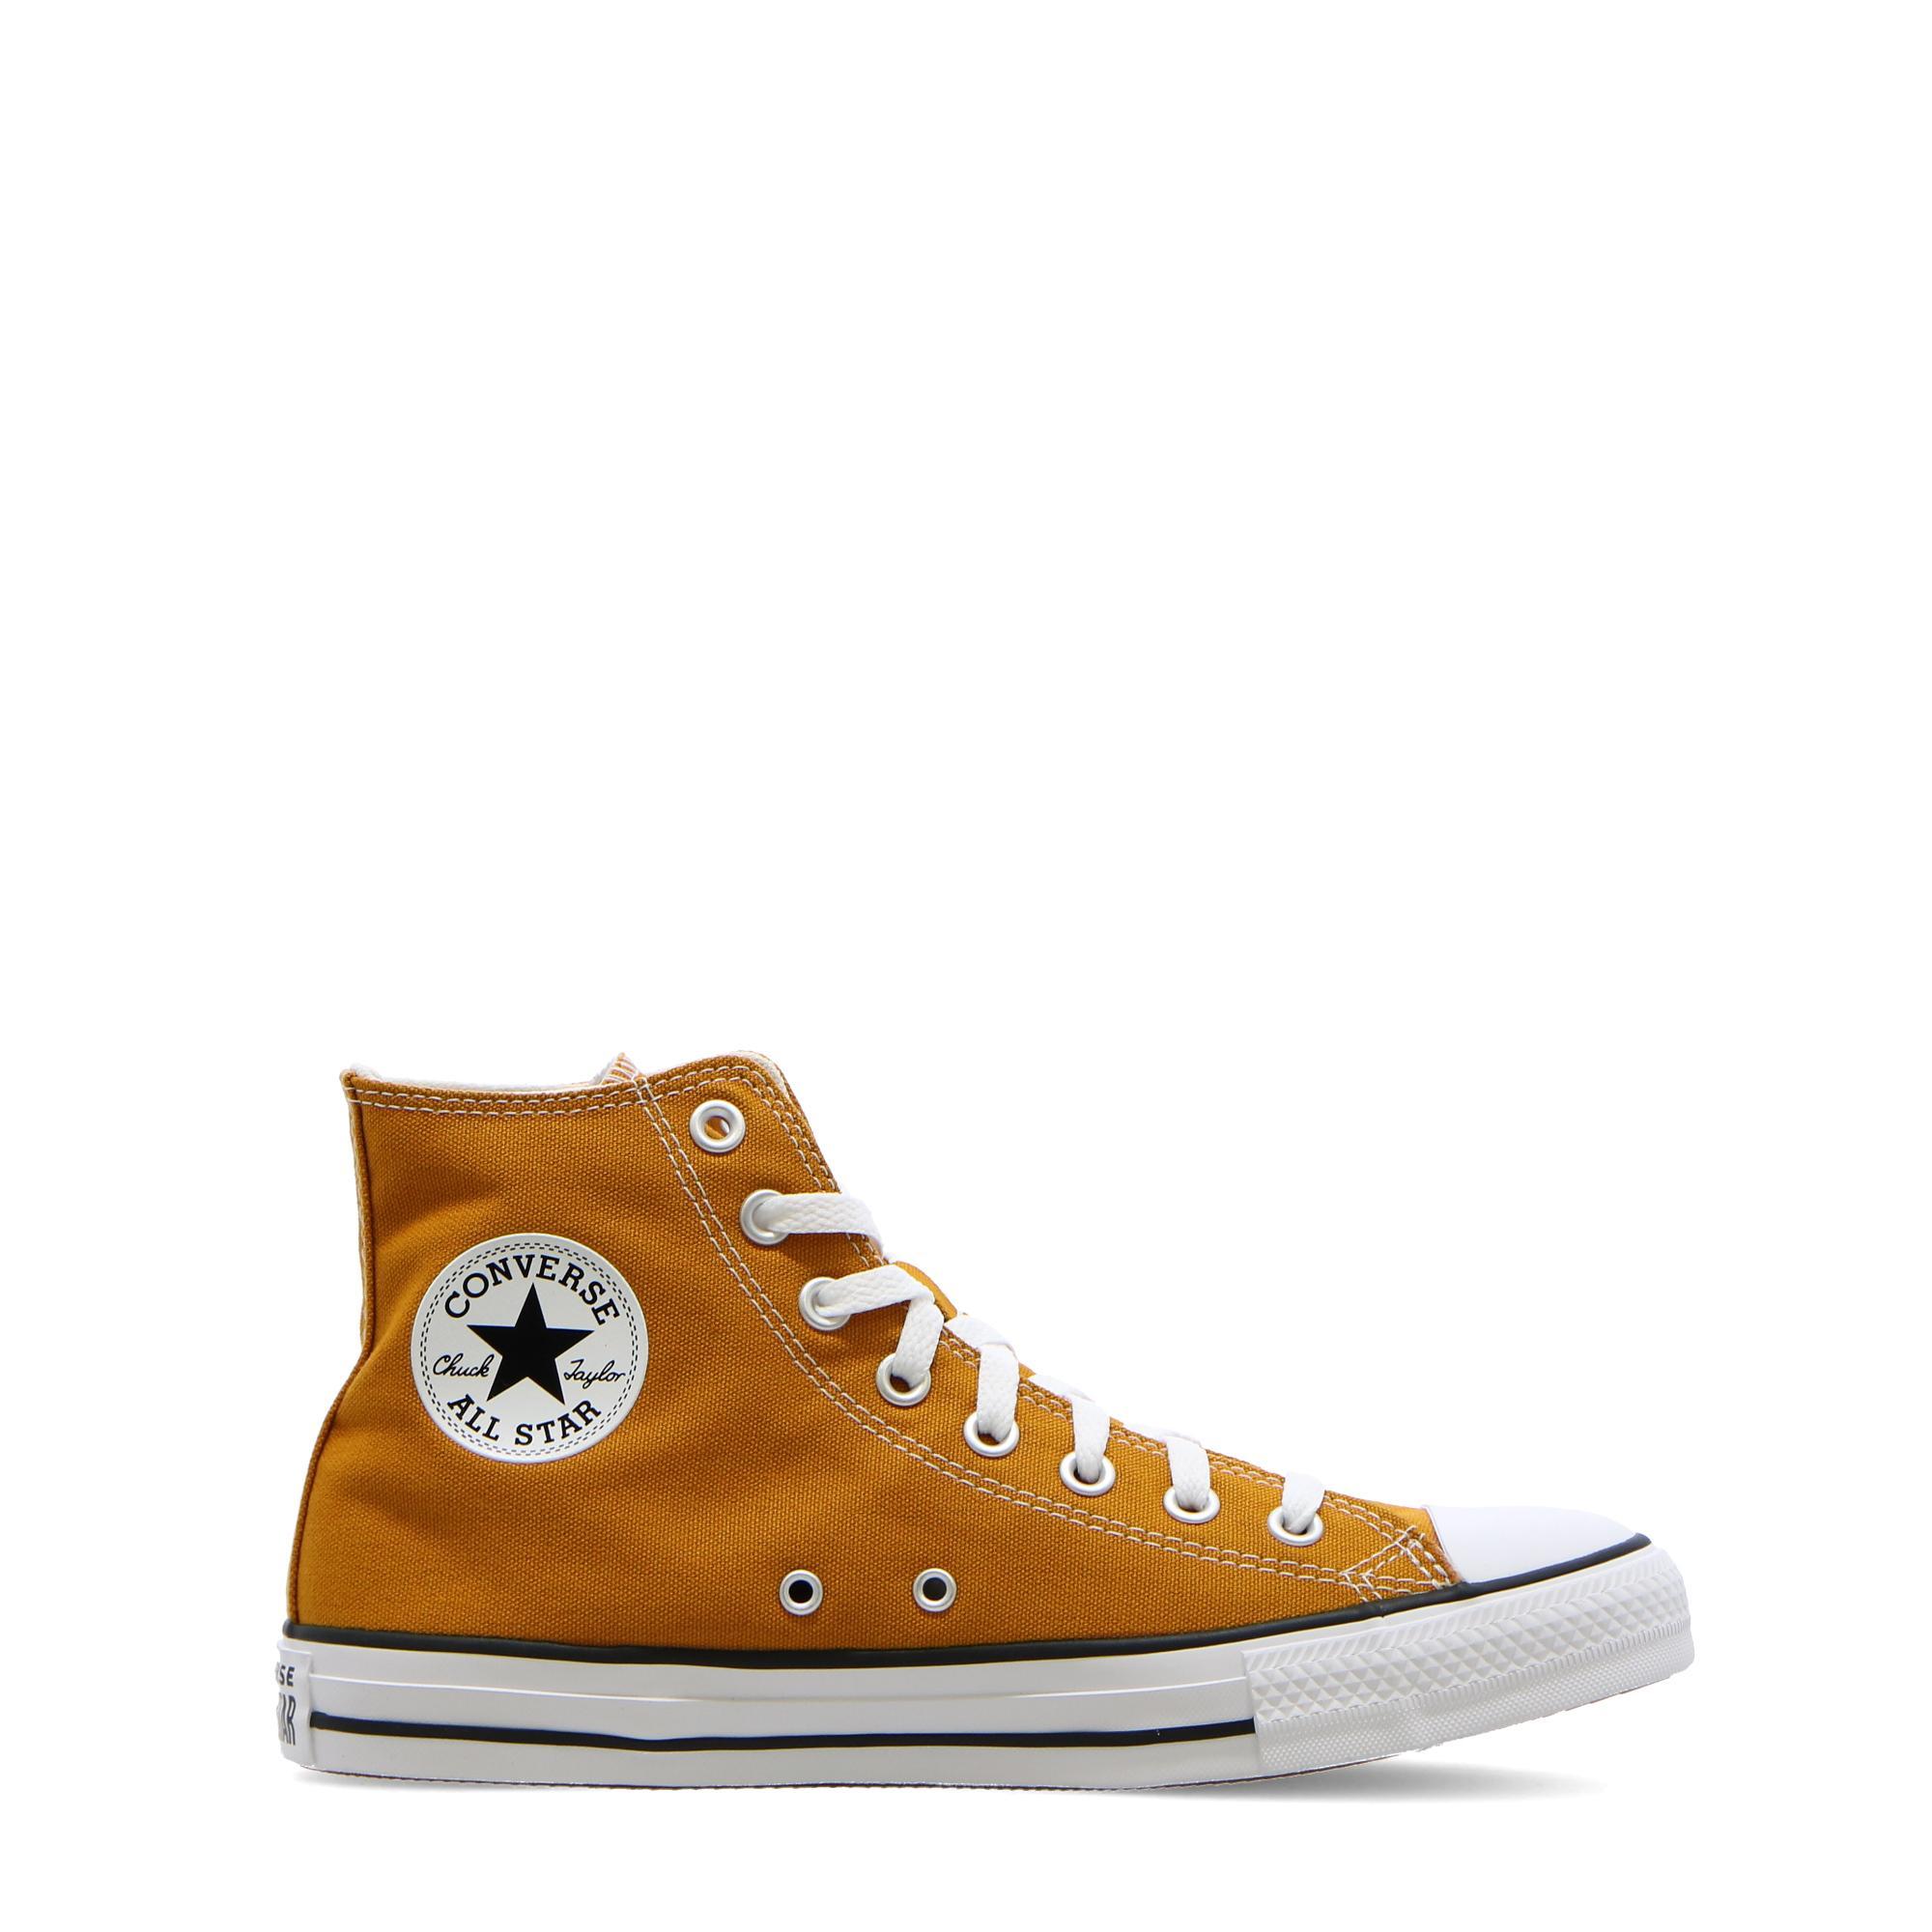 Converse Ct As Hi Canvas Core <br/> Saffron yellow